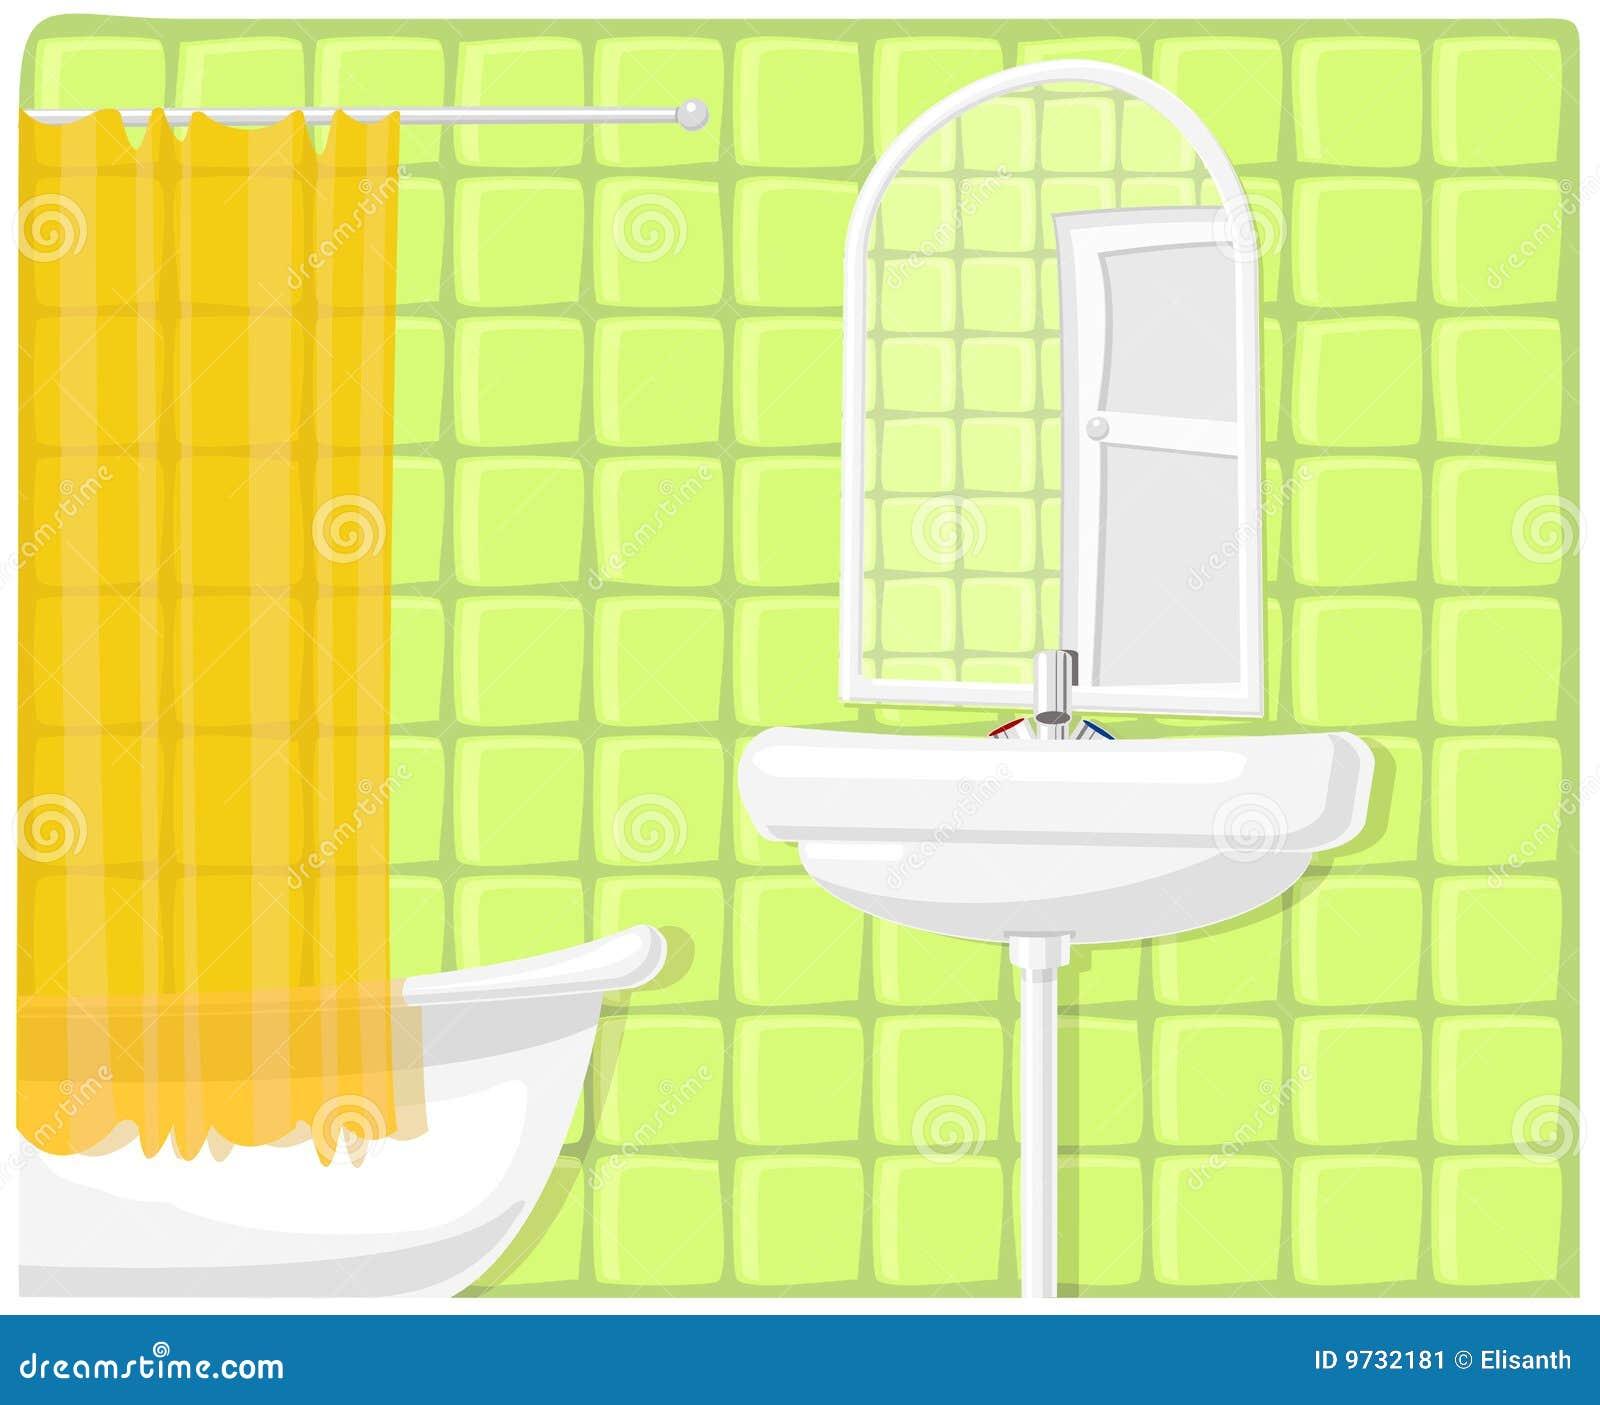 Vector illustration of bathroom stock image image 9732181 - Image of bathroom ...